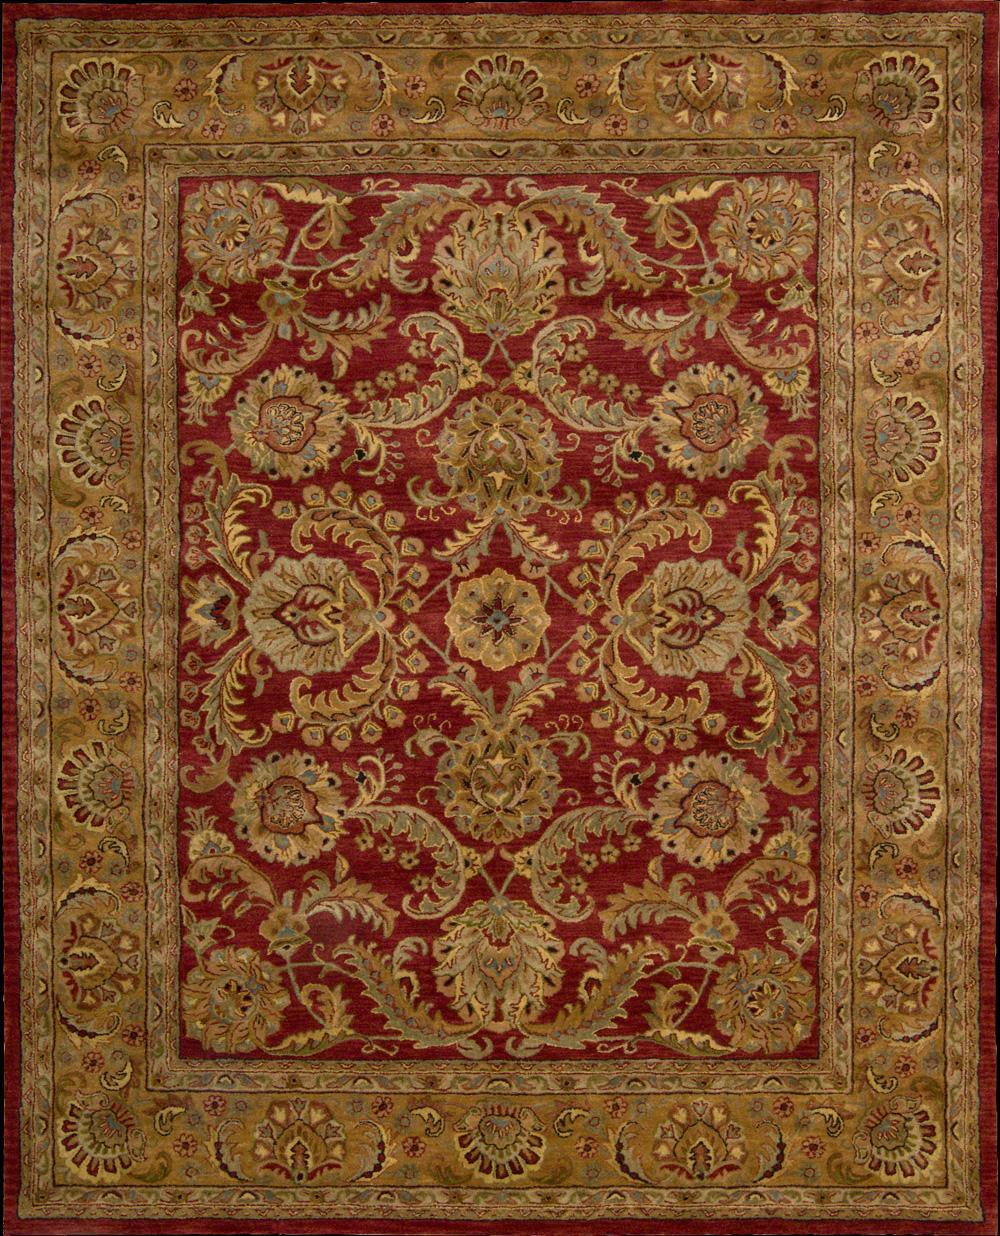 "Nourison Jaipur Area Rug 8'3"" x 11'6"" - Item Number: 49866"